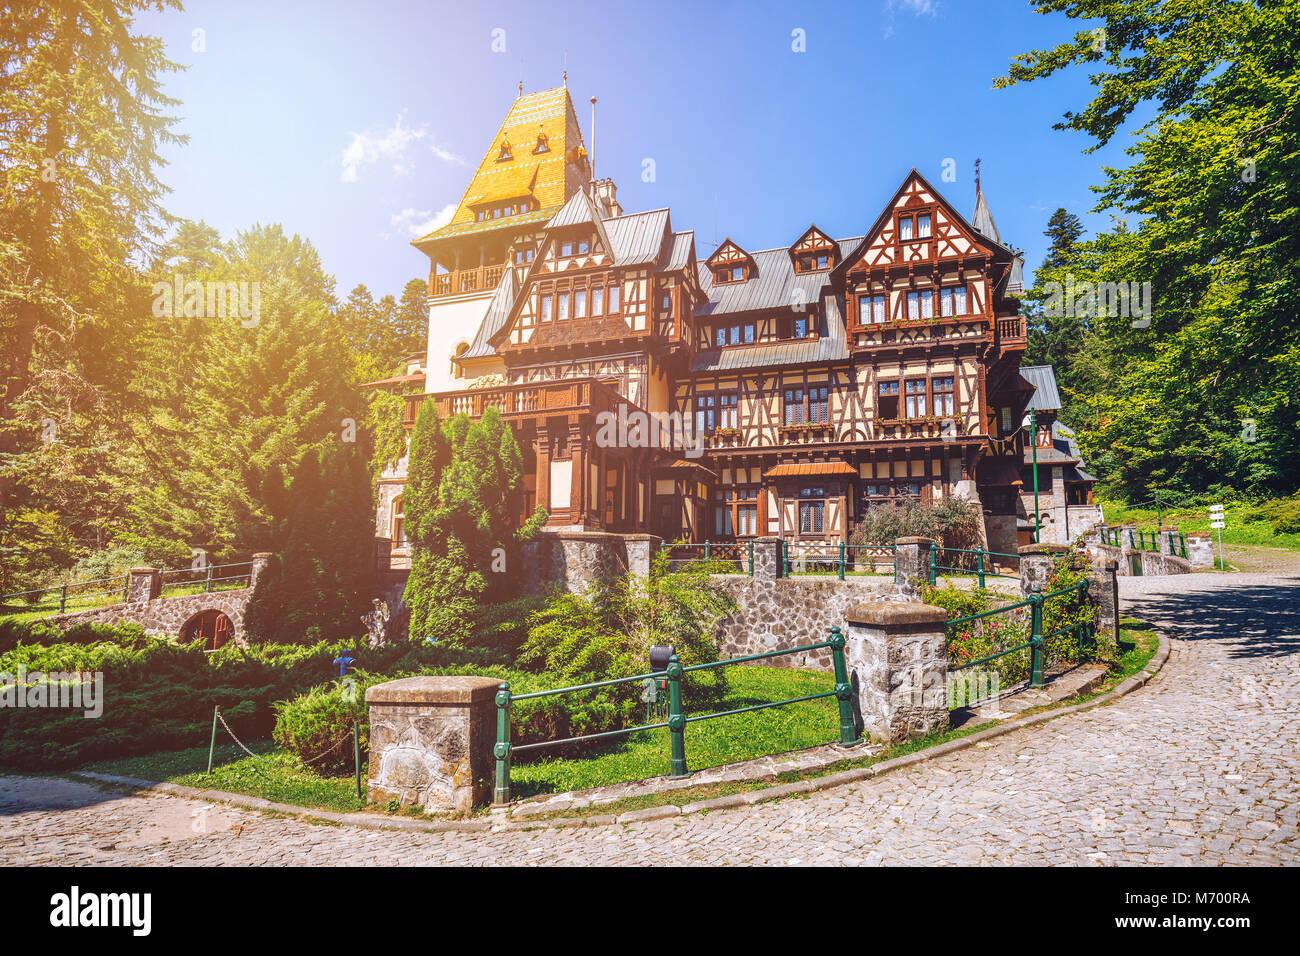 Pelisor castle, Sinaia, Romania. View of famous Pelisor castle situated next to the Peles castle near romanian city - Stock Image